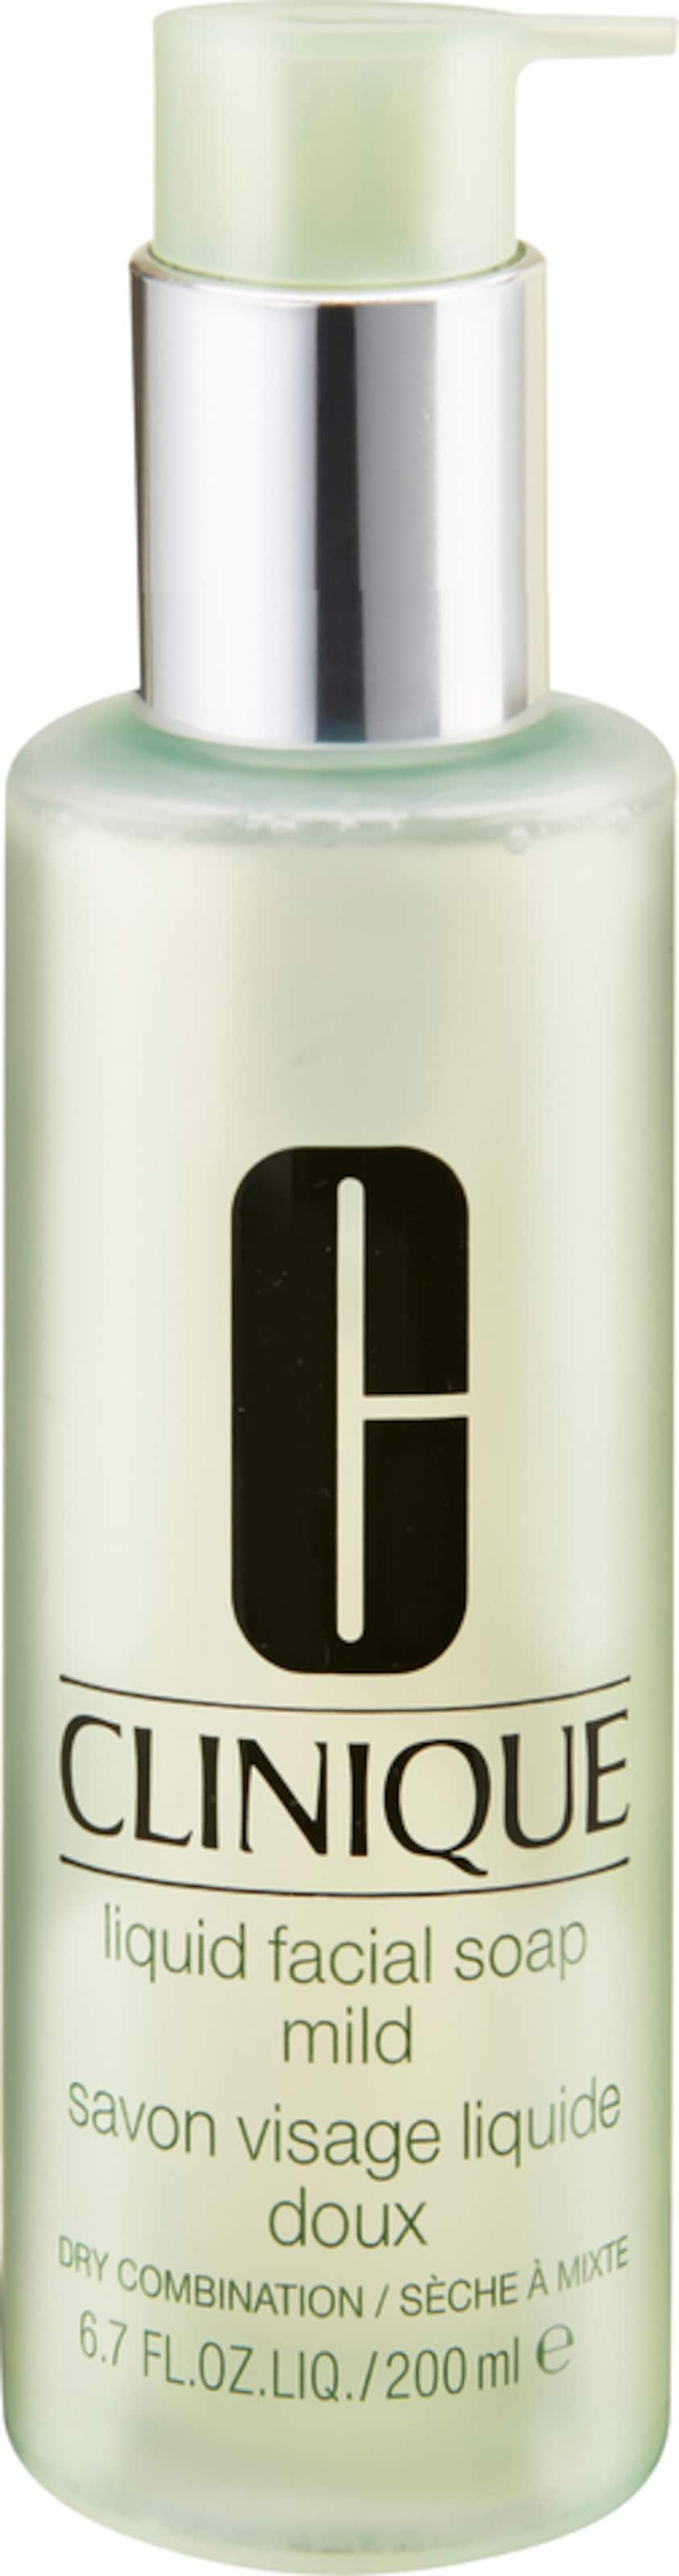 CLINIQUE 'Liquid Facial Soap - mild', Flüssige Gesichtsseife